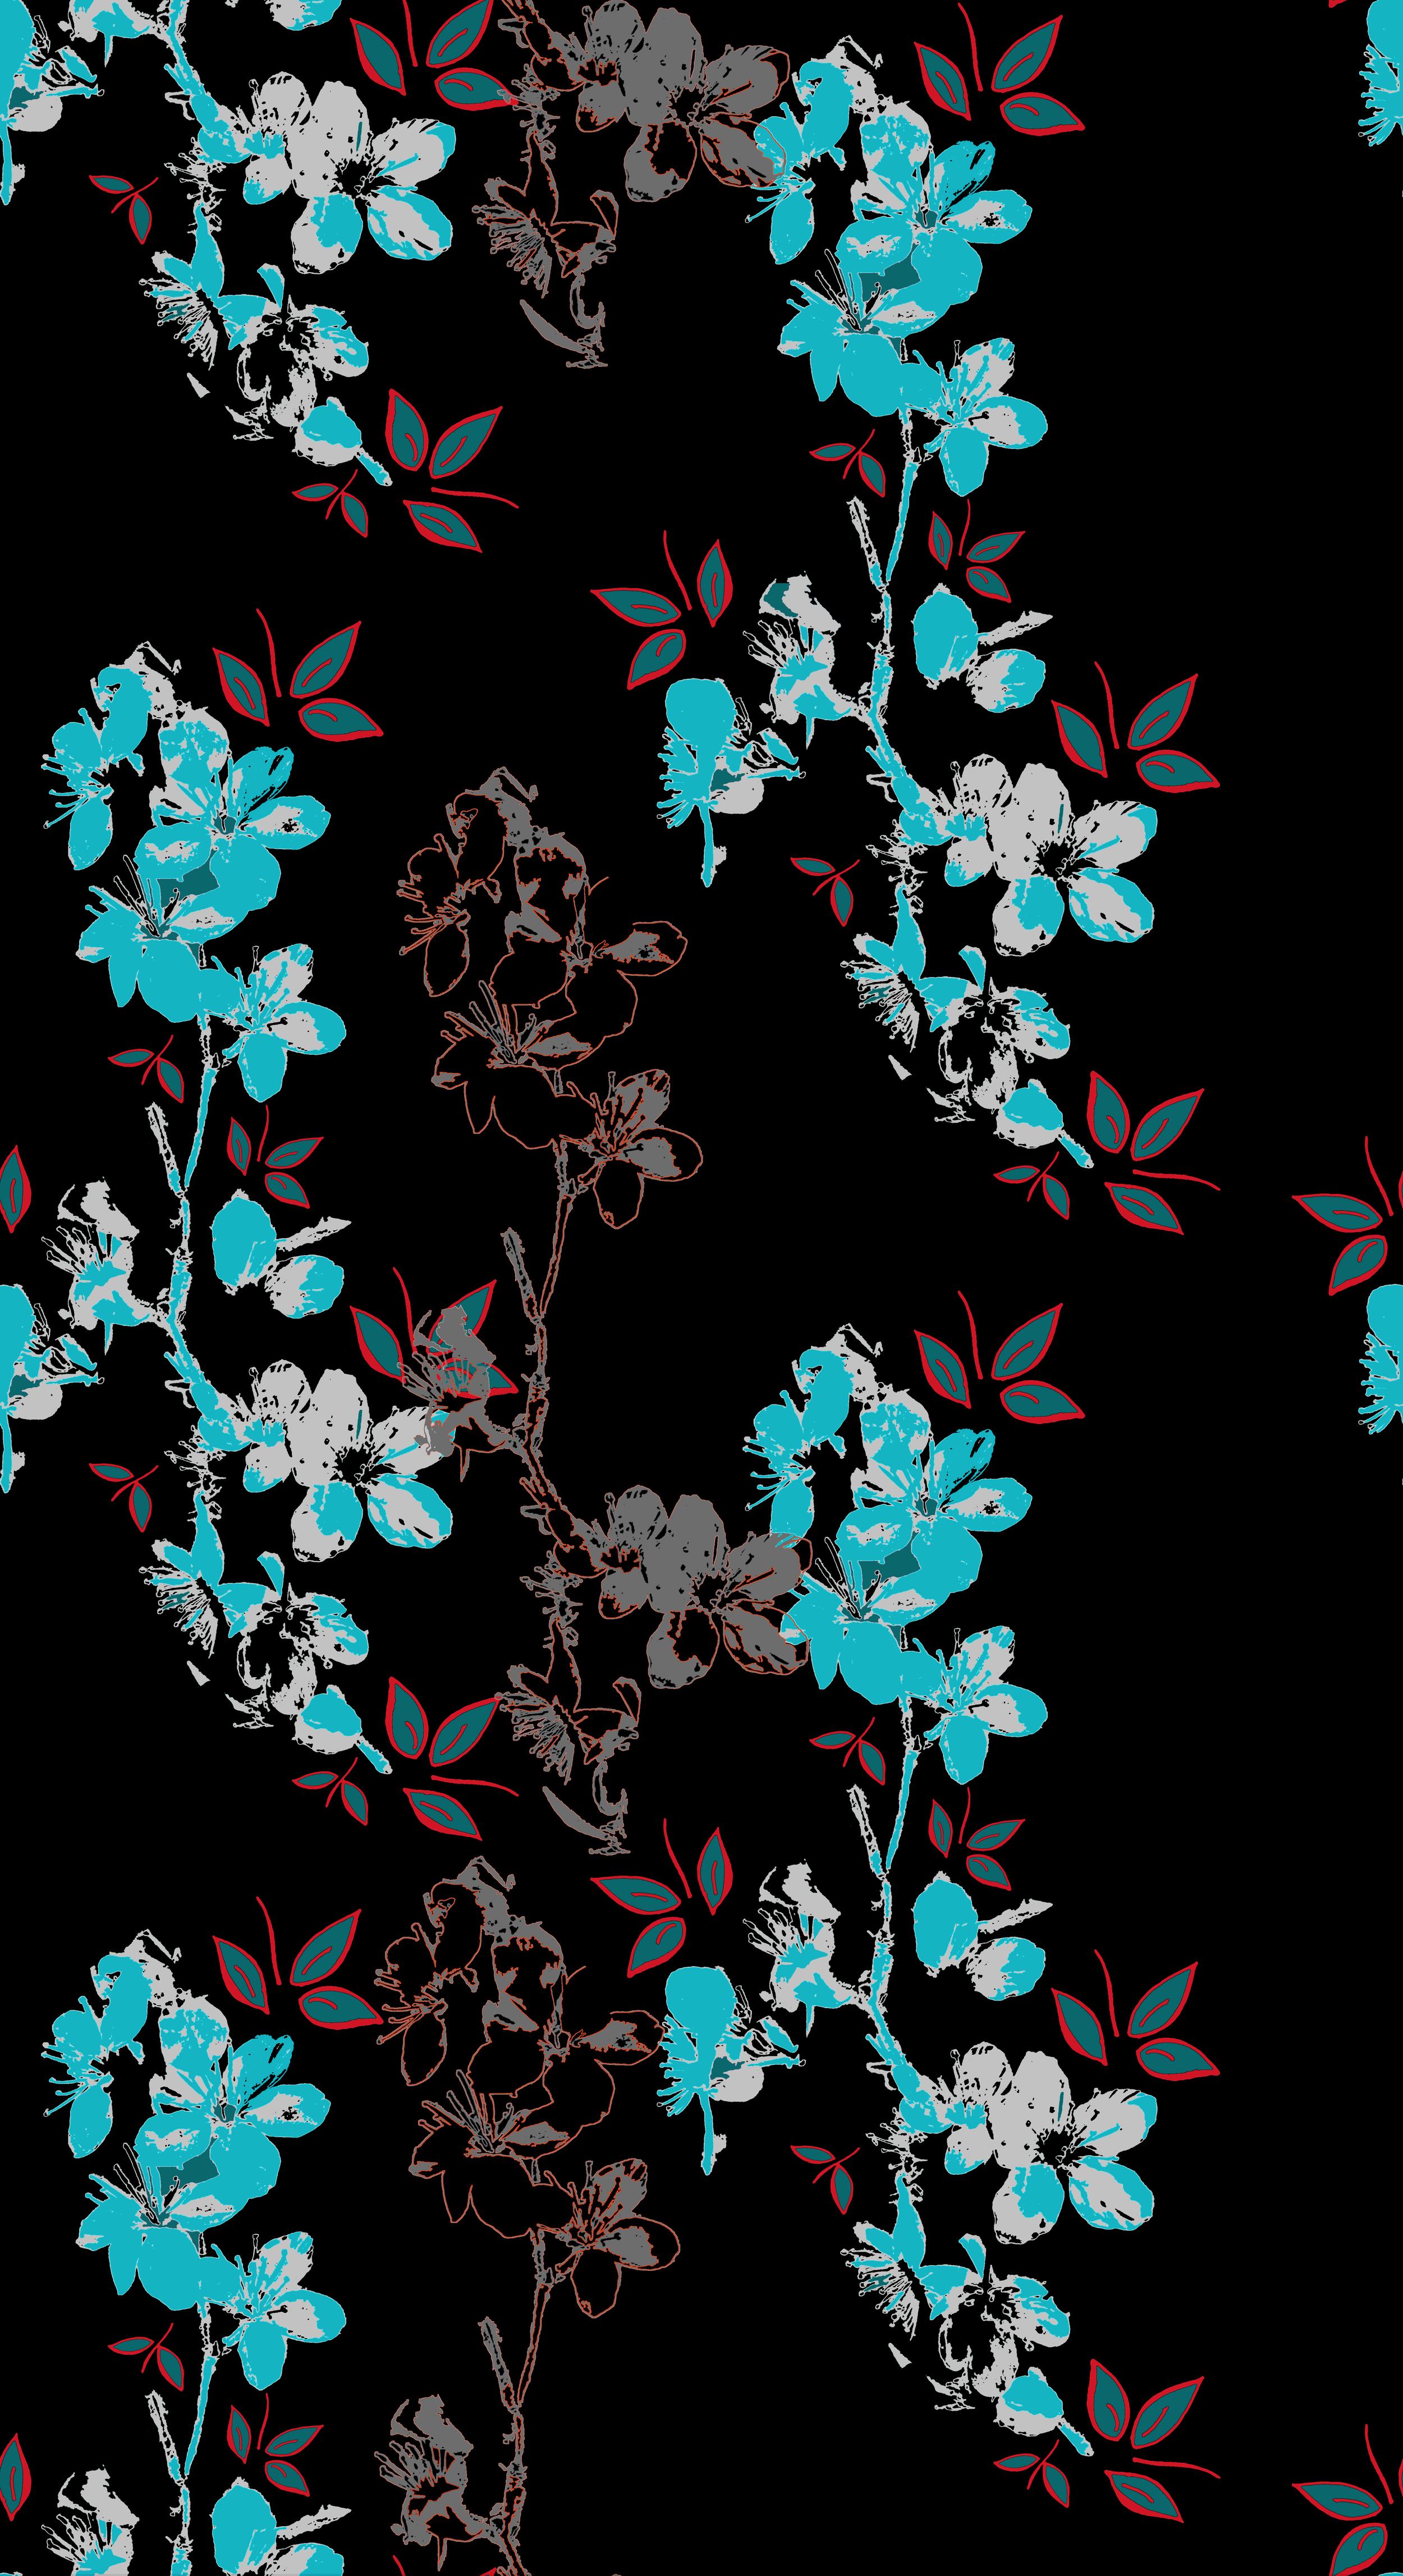 blossom design wallpaper black